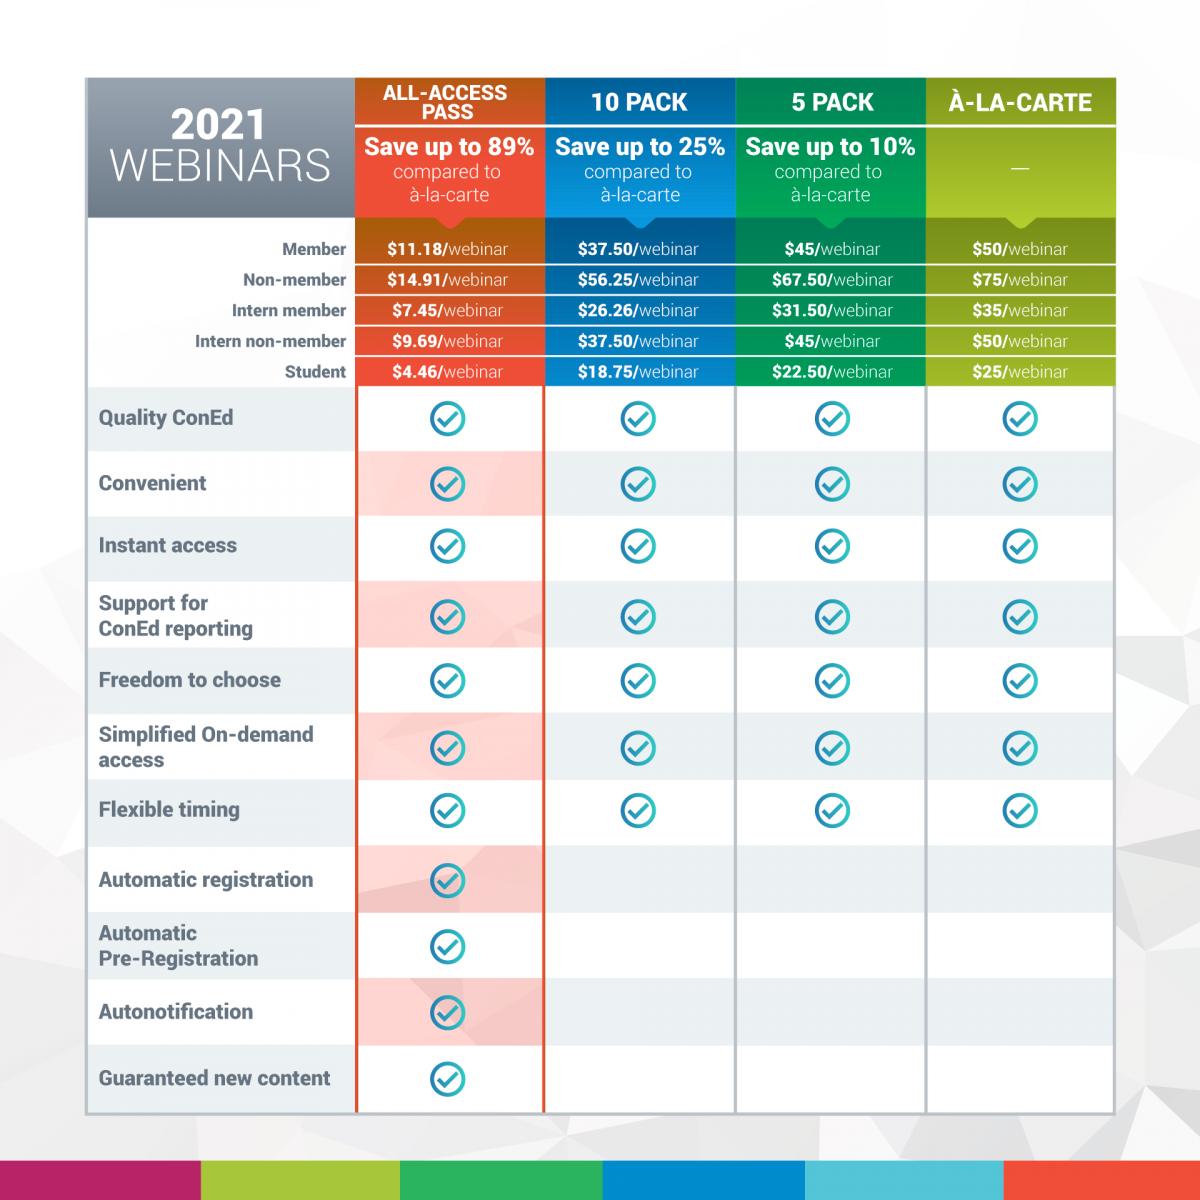 RAIC 2021 webinar pricing chart